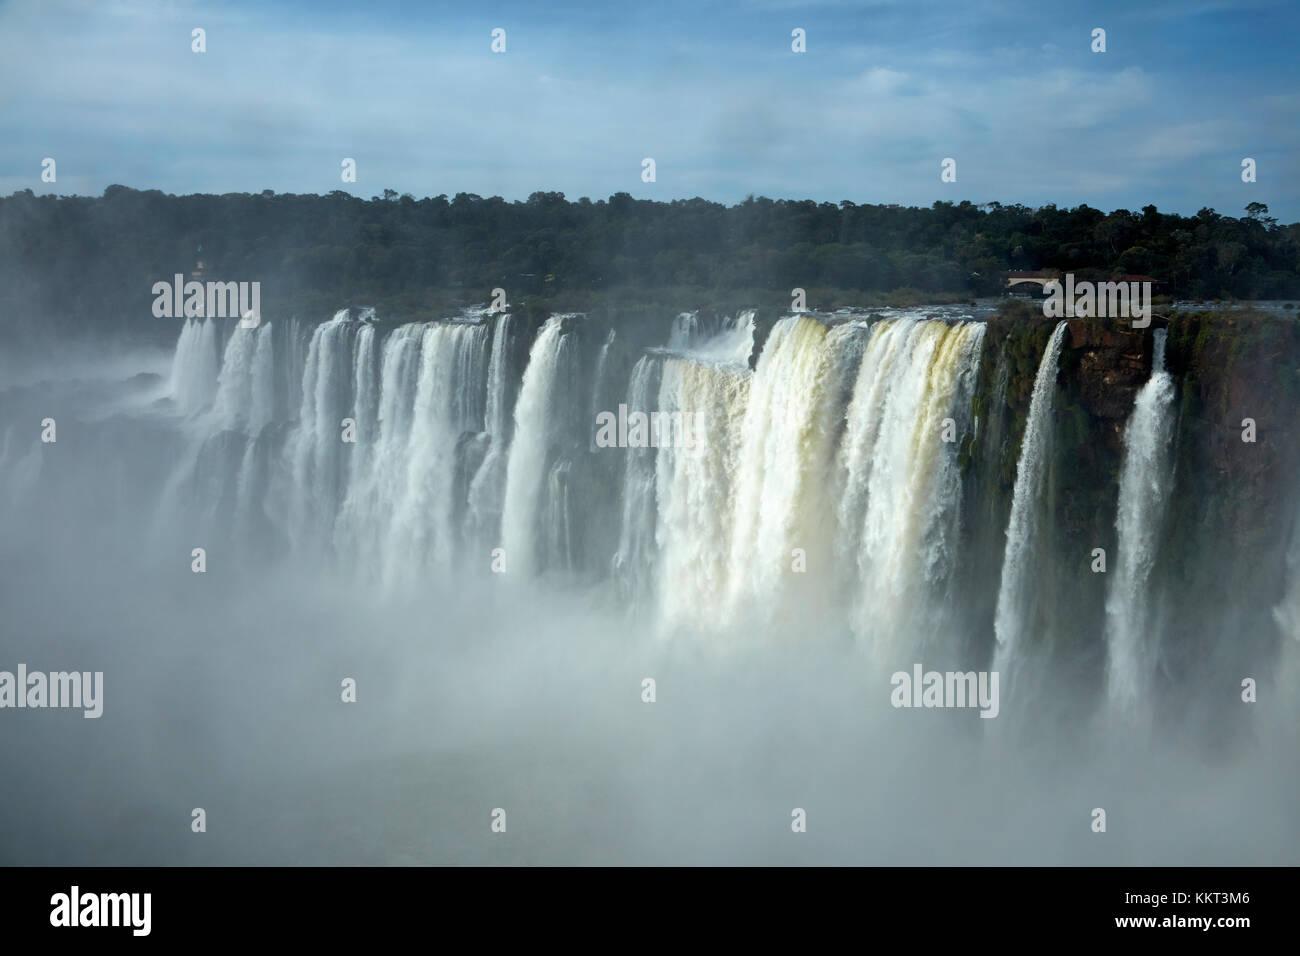 Devil's Throat (Garganta del Diablo), Iguazu Falls, on Argentina - Brazil Border, South America - Stock Image